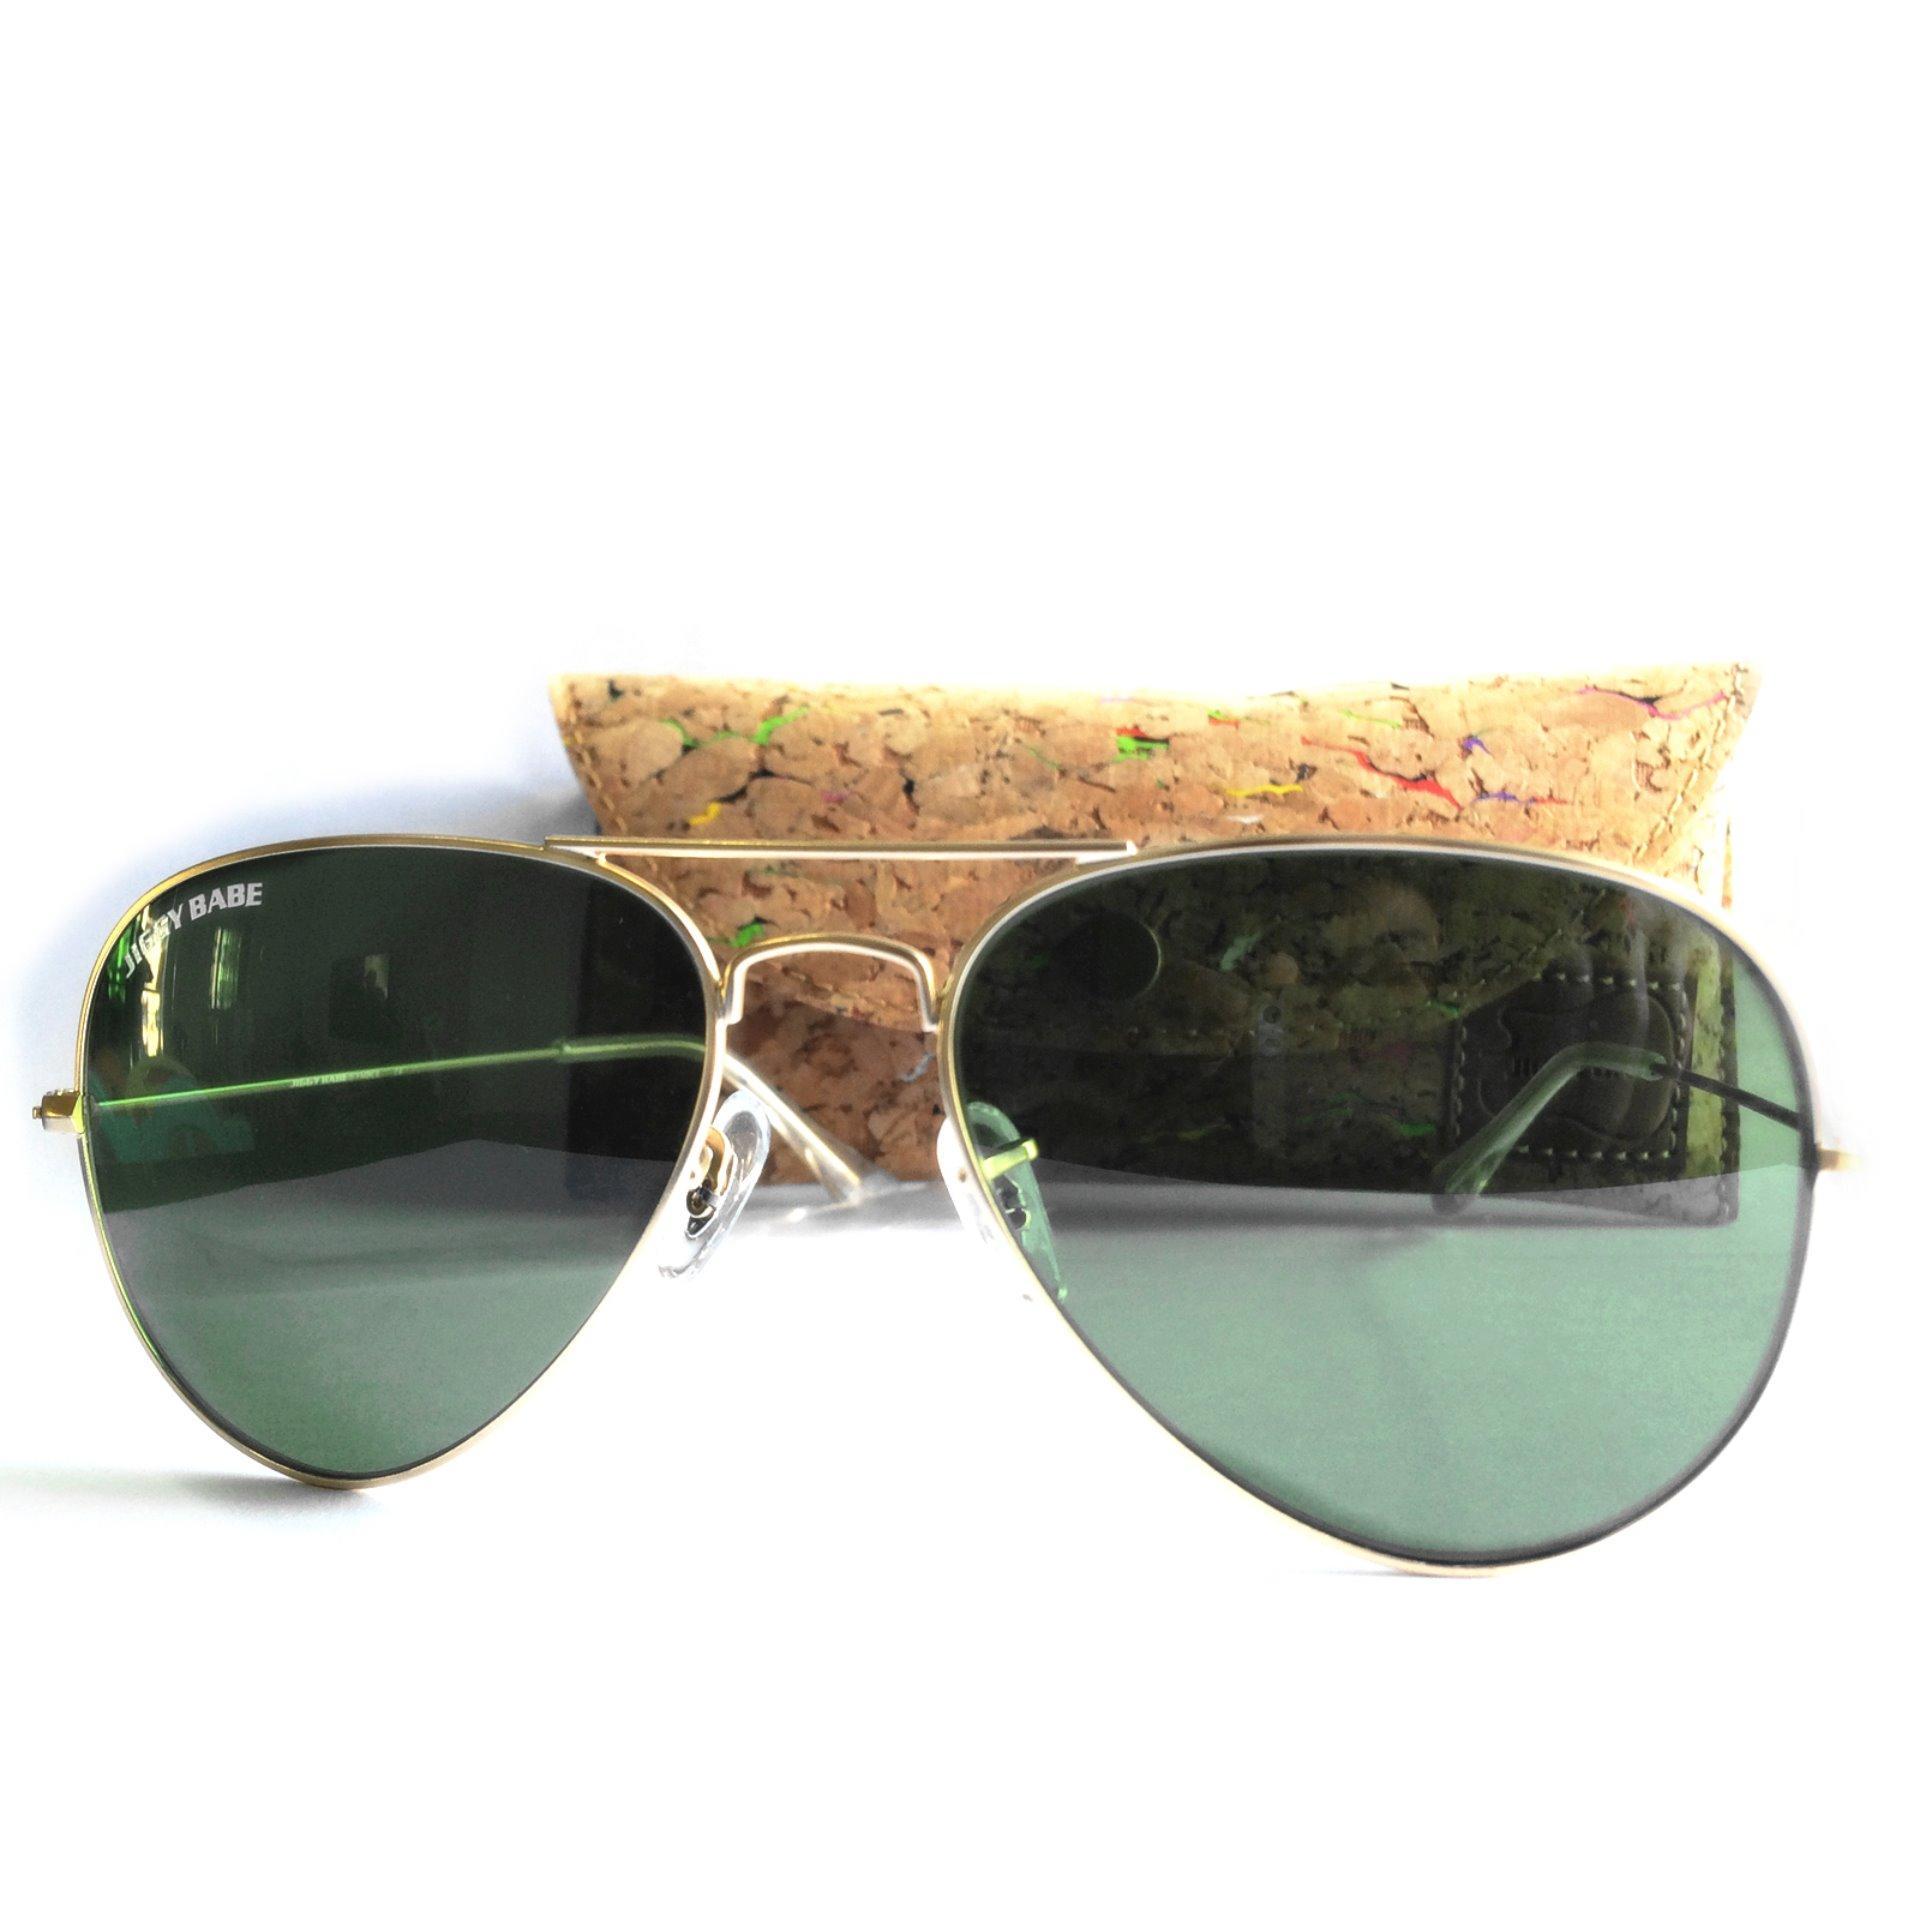 e3126adc38 Top Original Brand Name Designer Polarized Aviator Sunglasses Retro 3025  Large Metal UV400 Men Women Premium